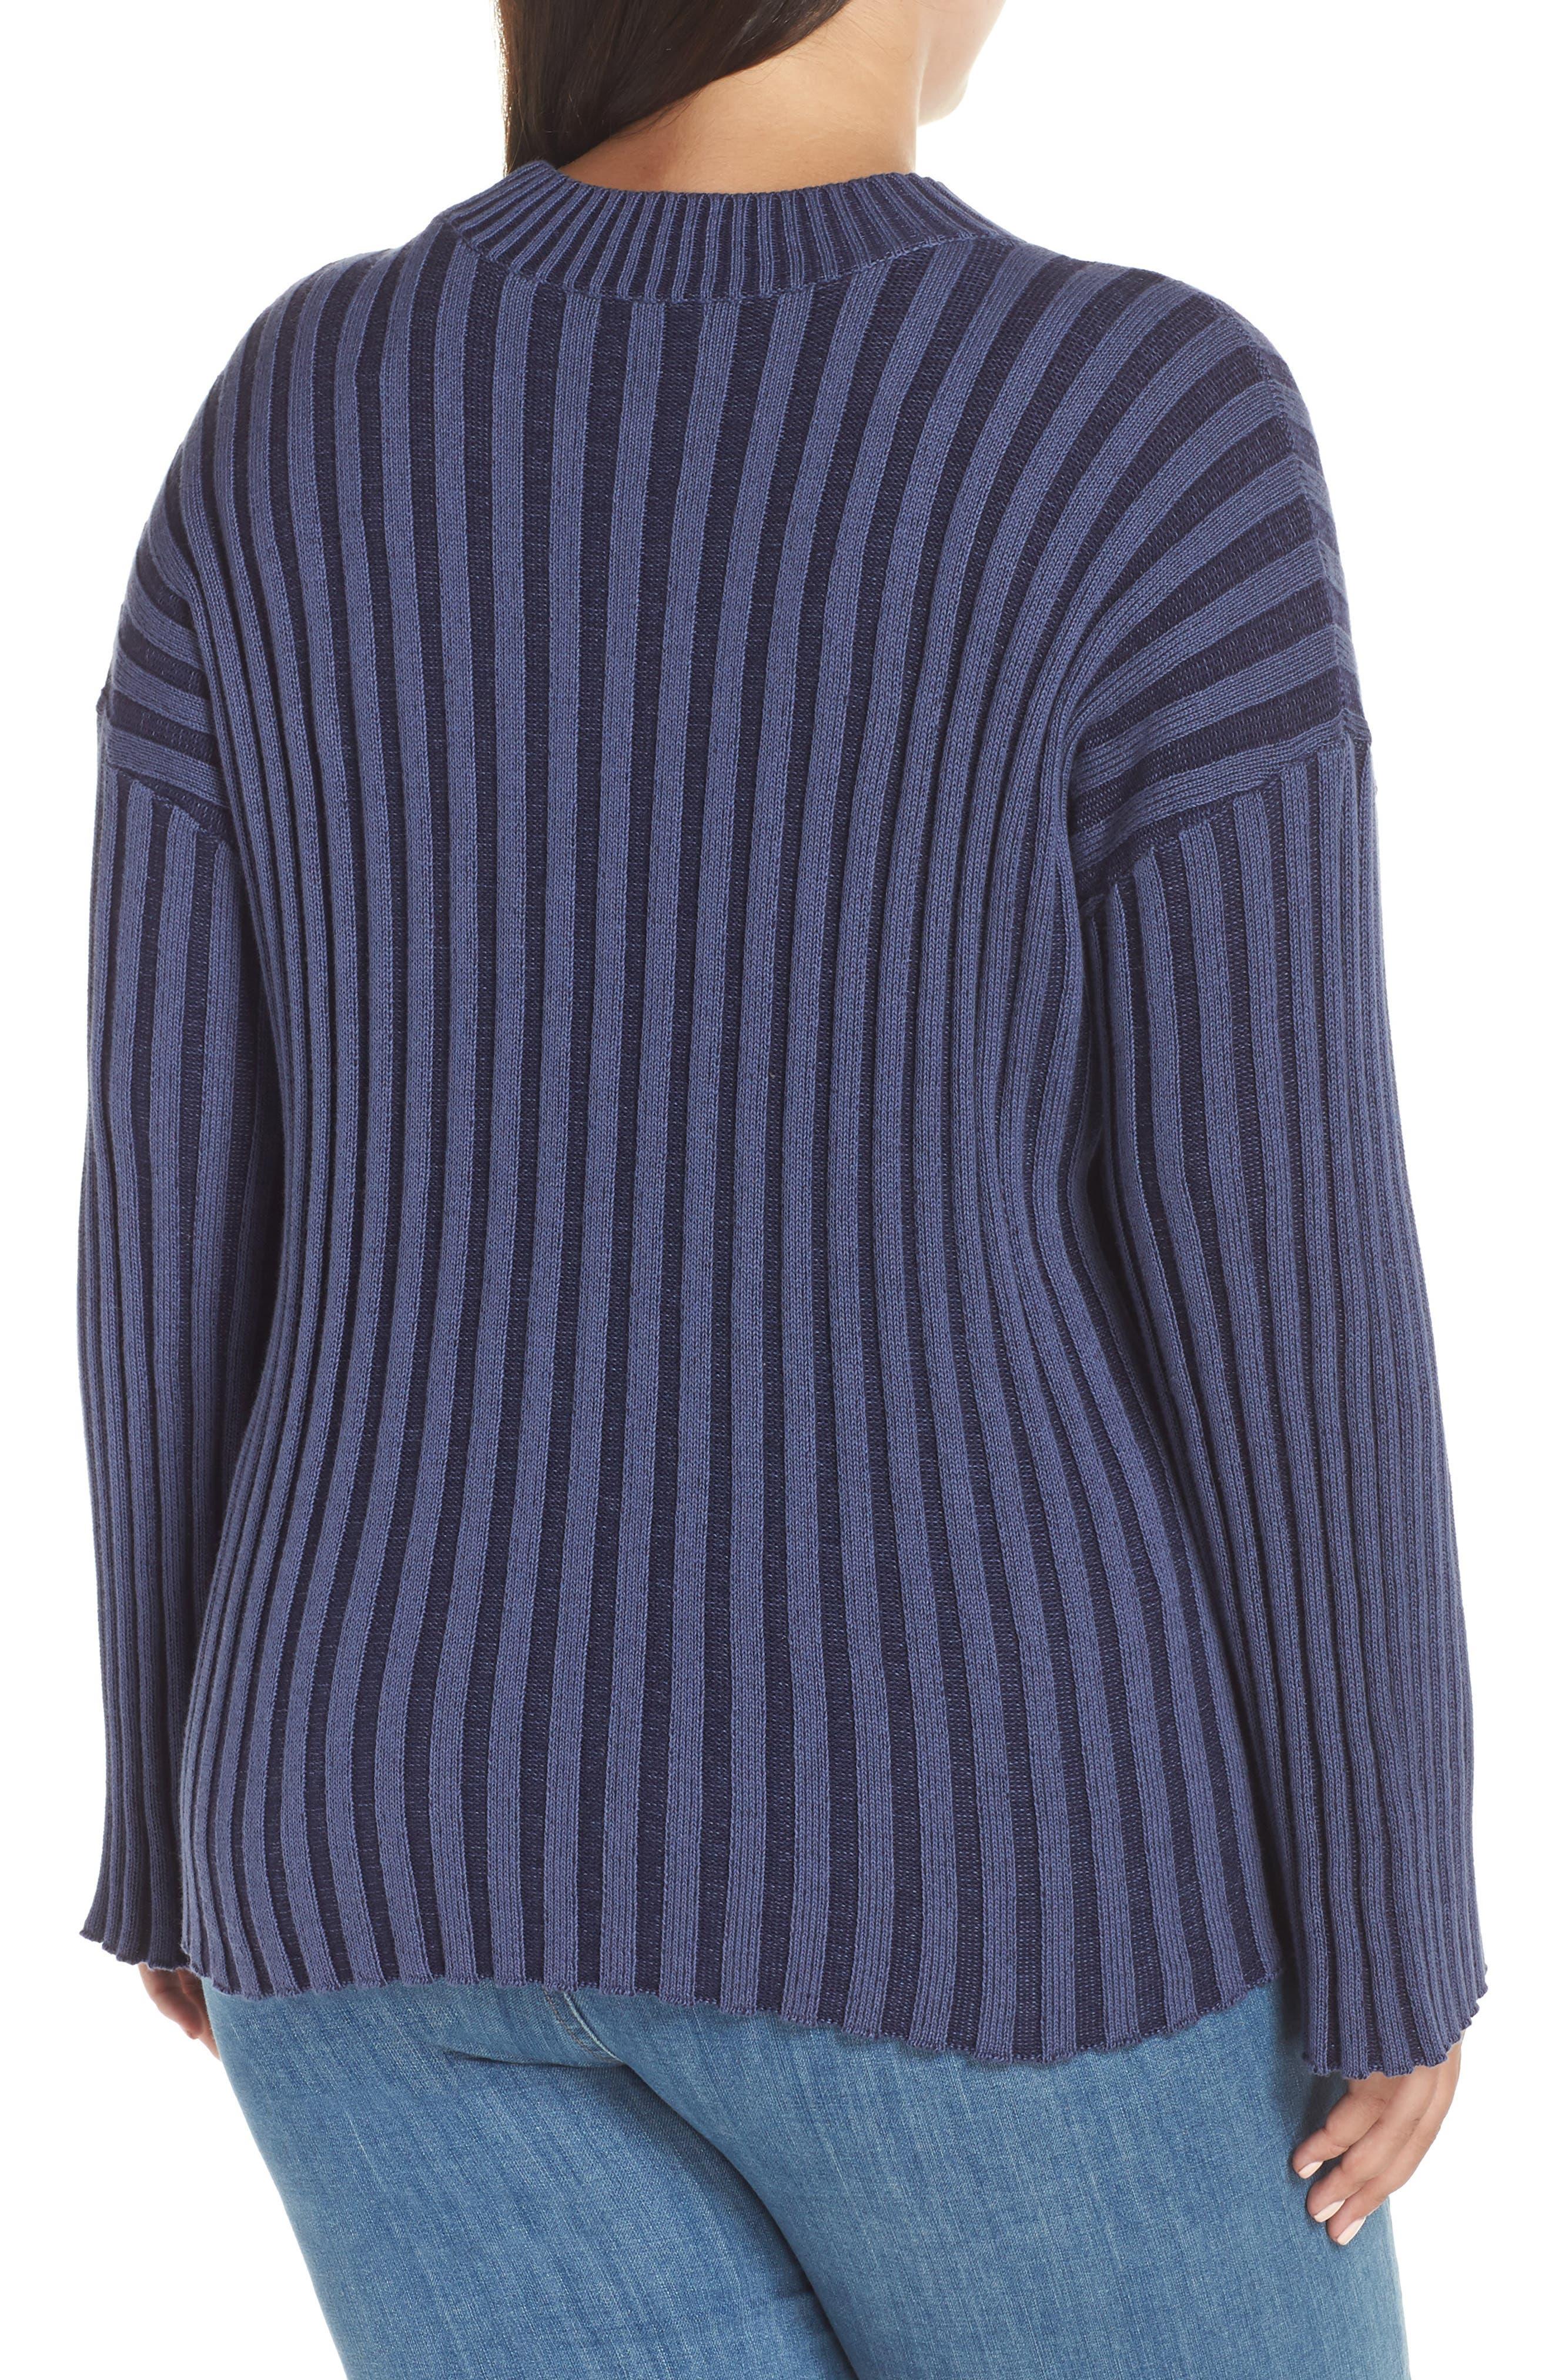 Shadow Rib Crop Sweater,                             Alternate thumbnail 8, color,                             NAVY EVENING